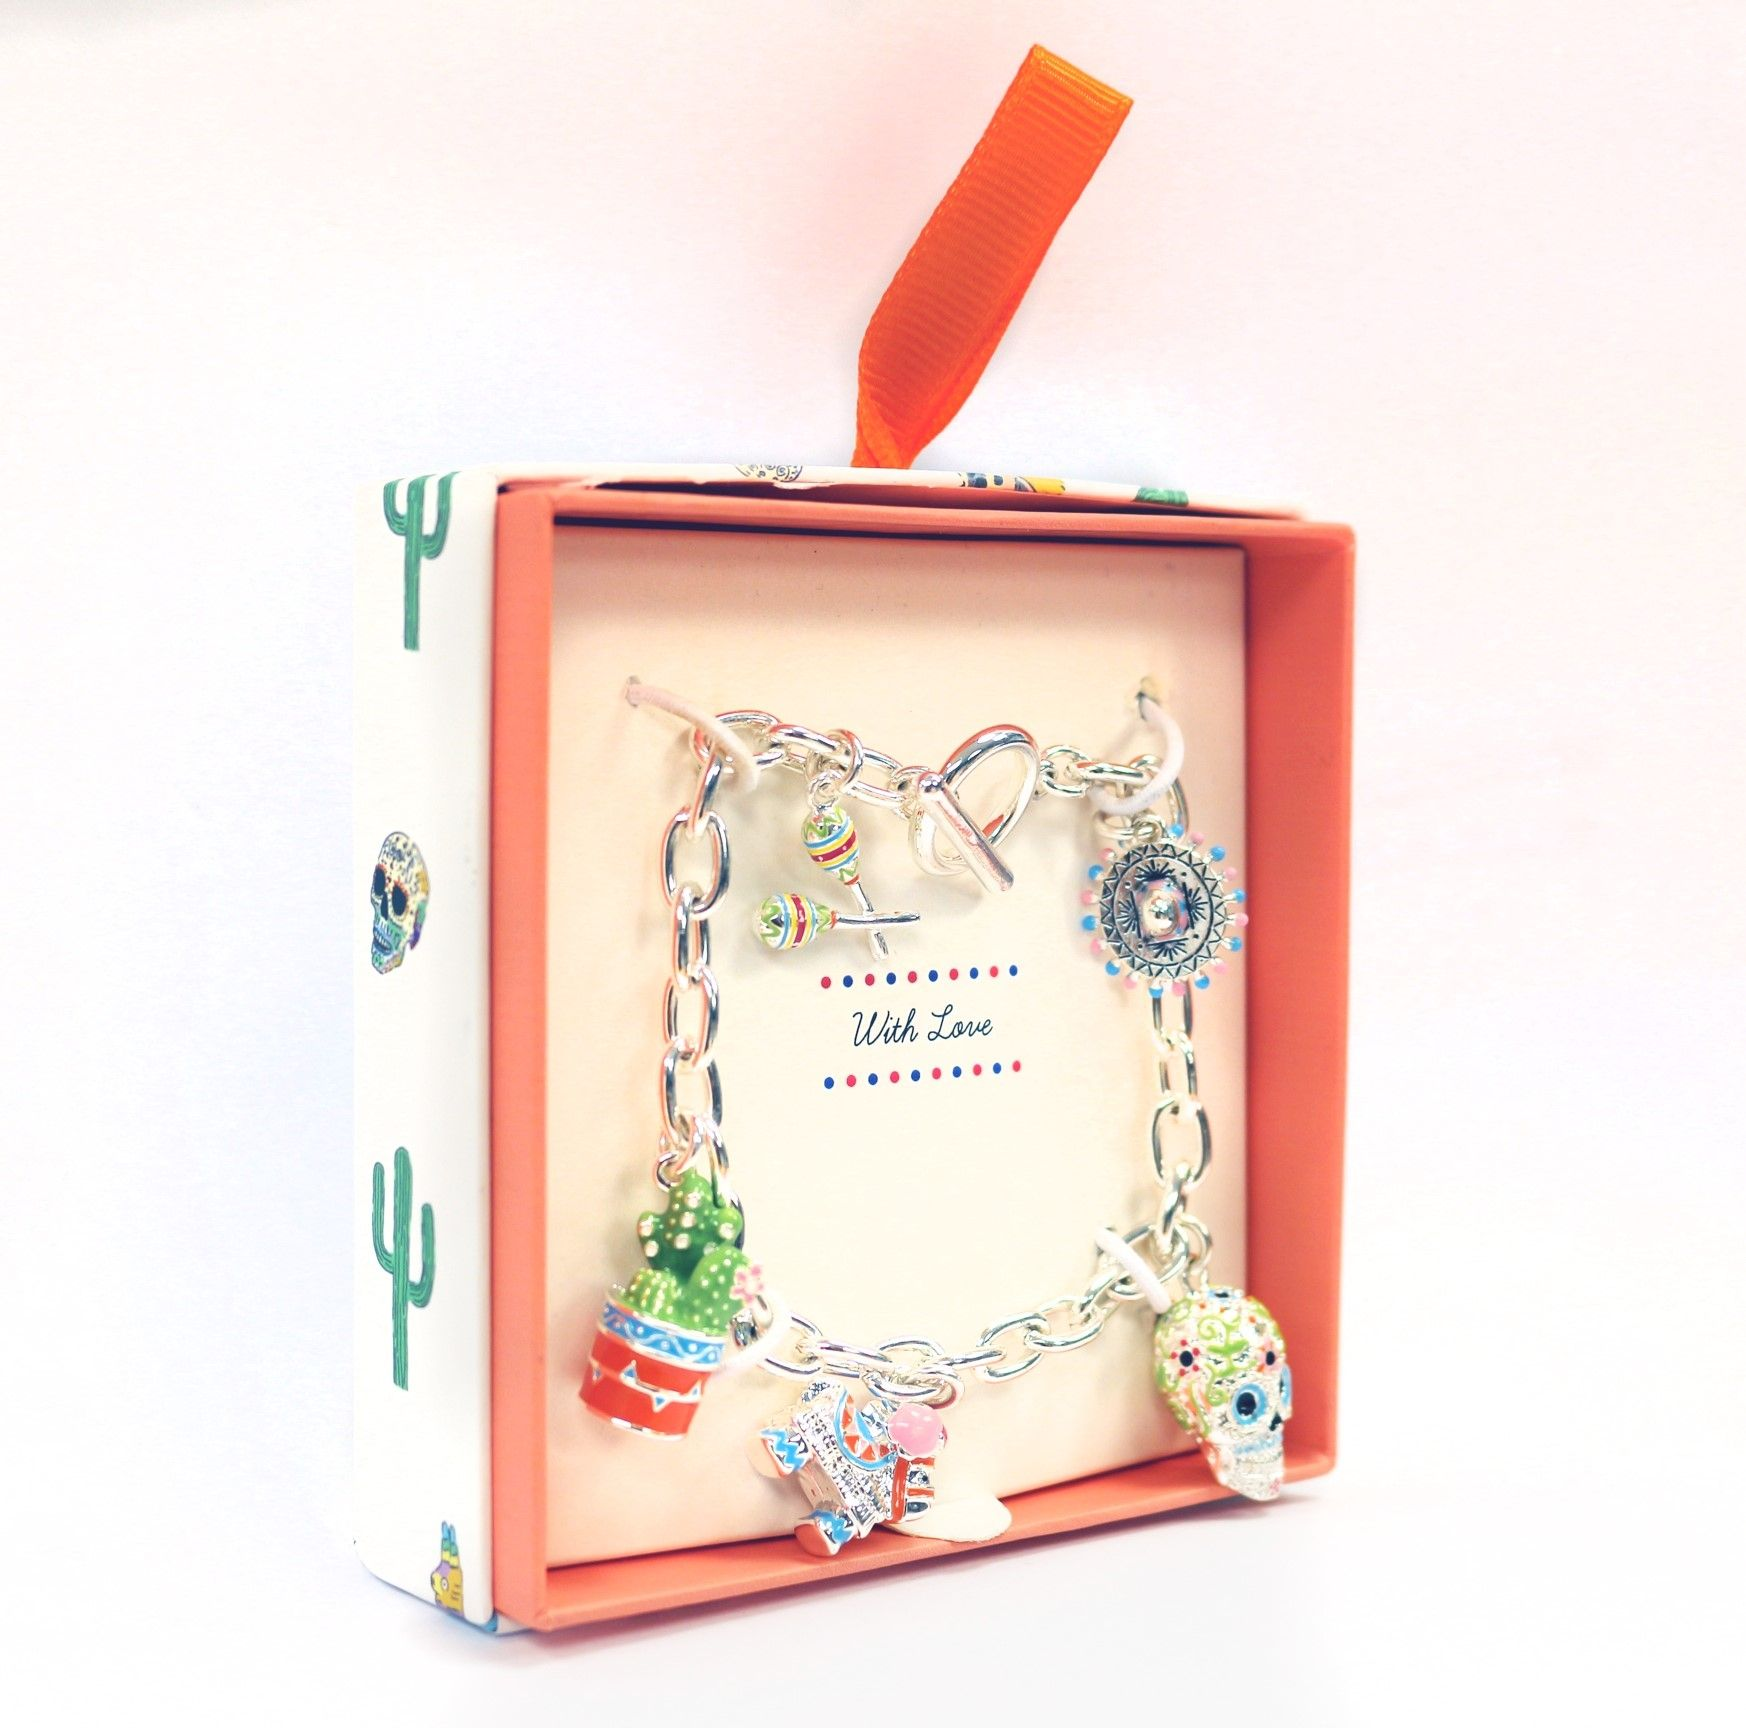 Buckley London Mexican Charm Bracelet Box